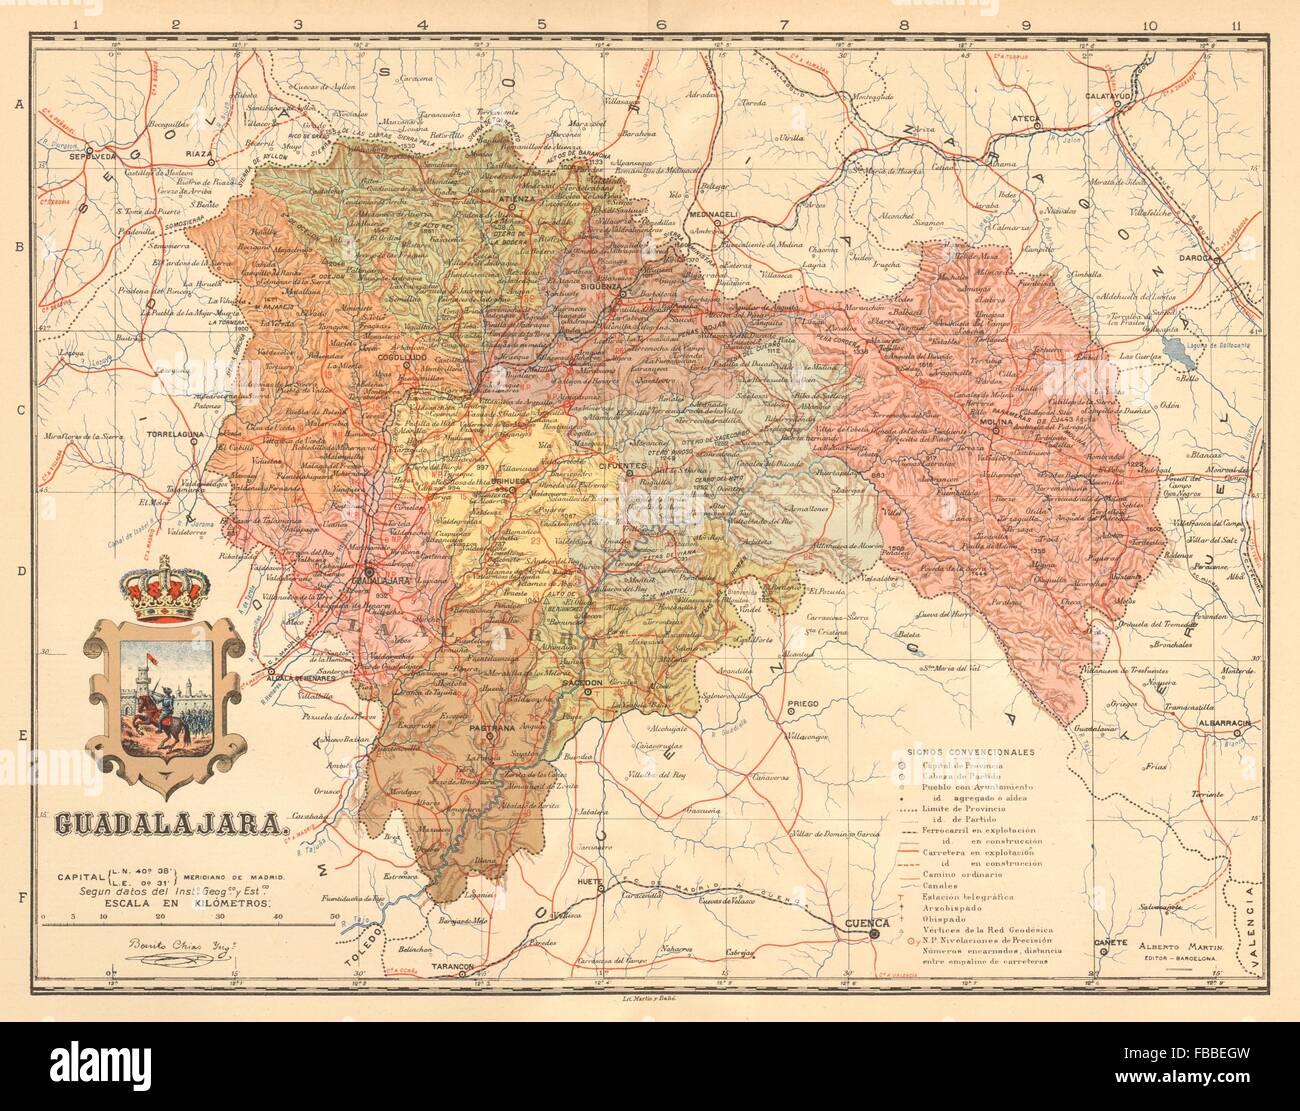 Mapa Provincia De Guadalajara.Guadalajara Castilla La Mancha Mapa Antiguo De La